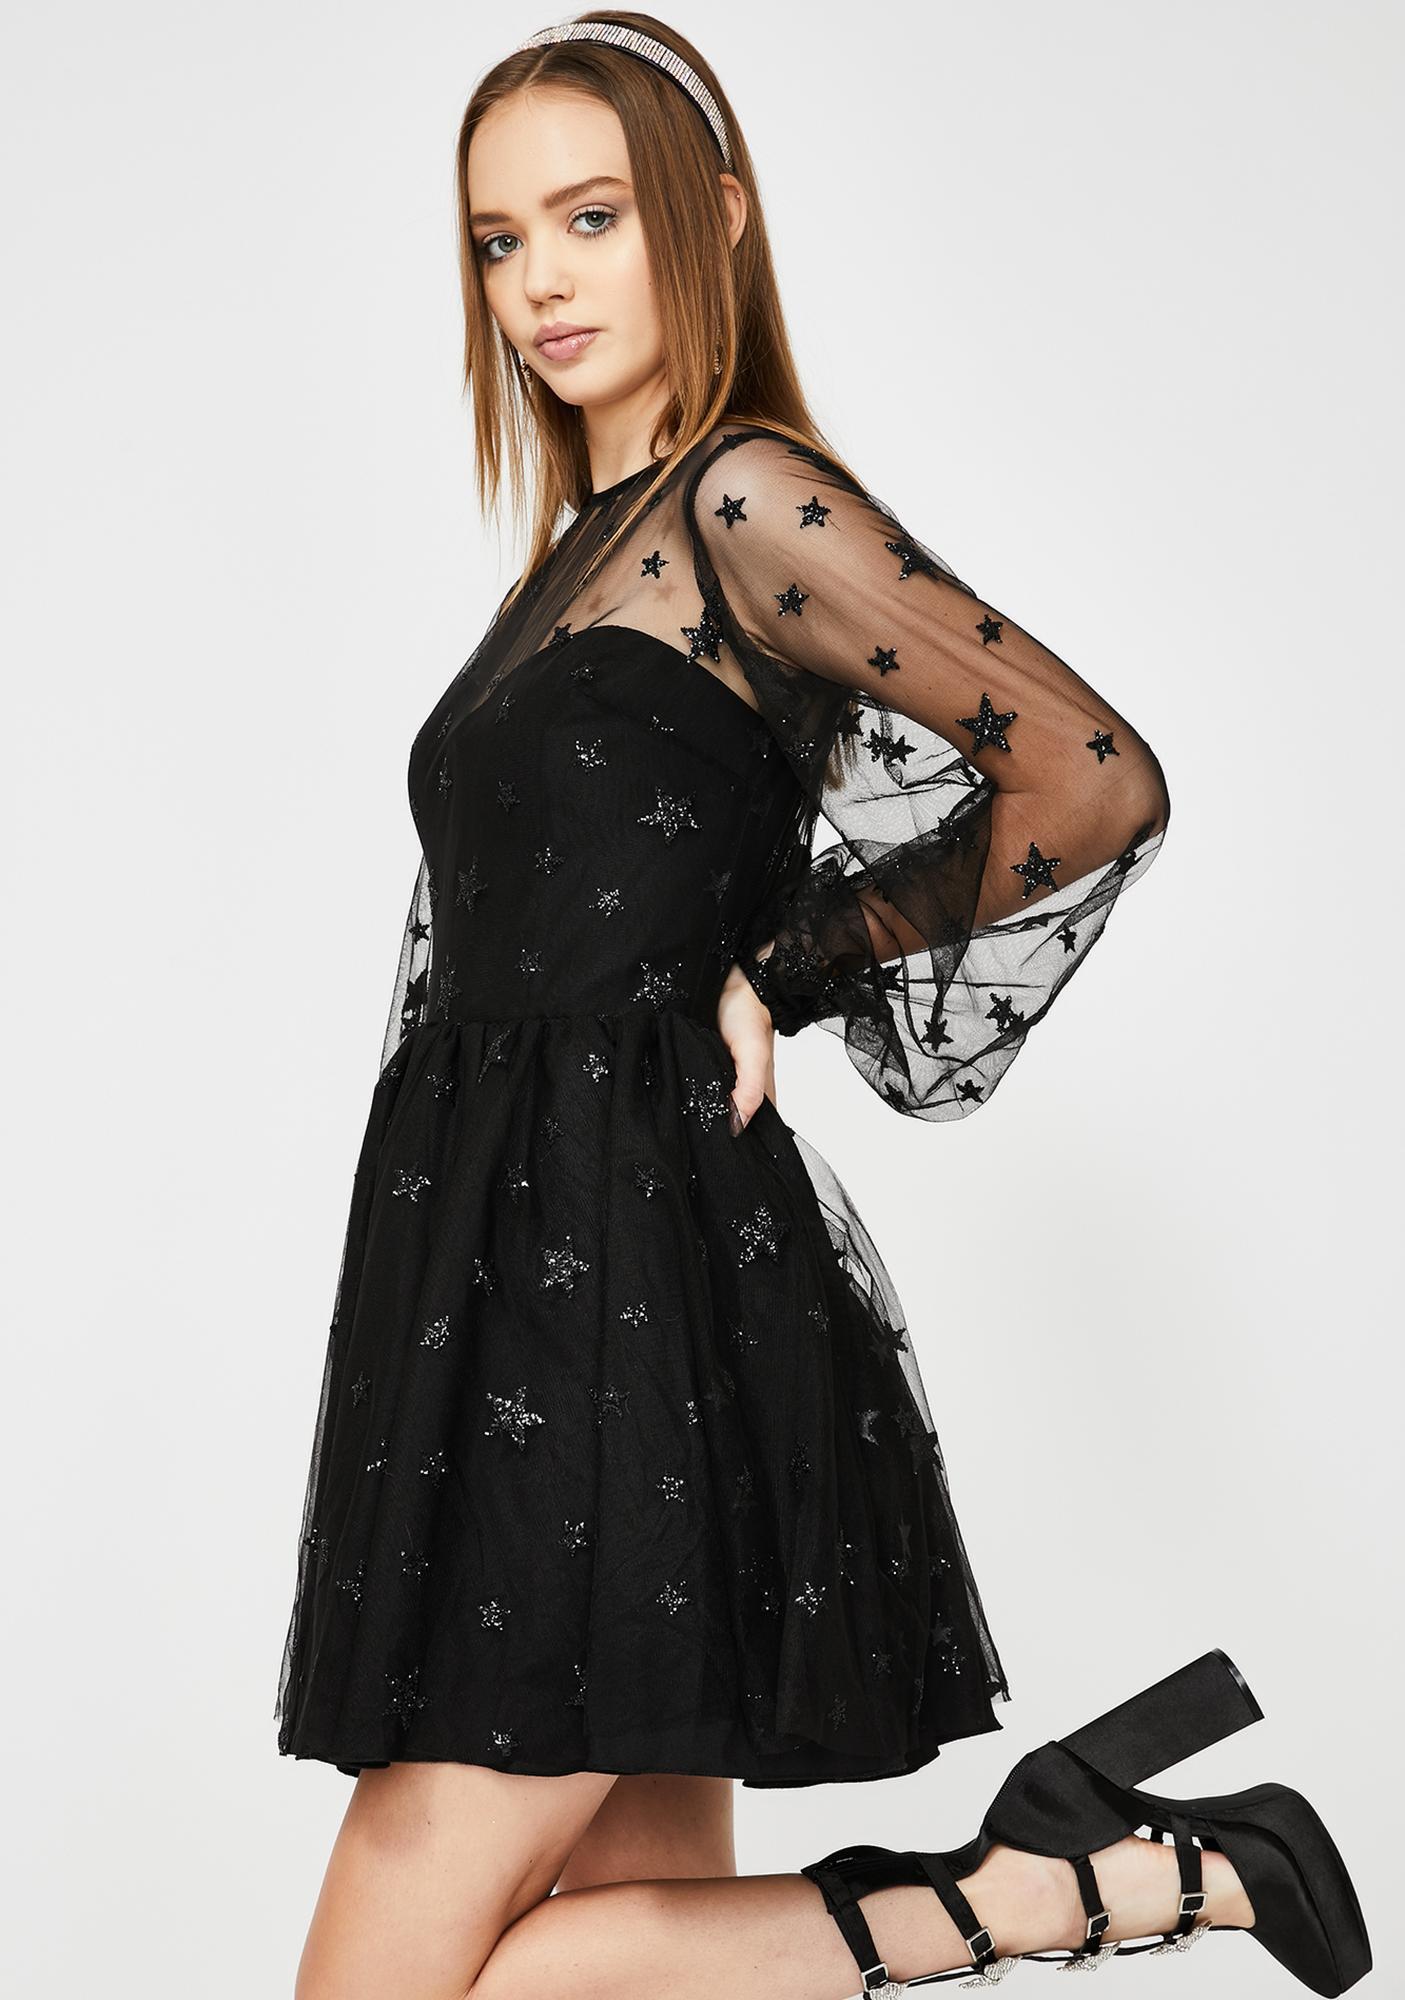 Lirika Matoshi Teuta Mini Dress